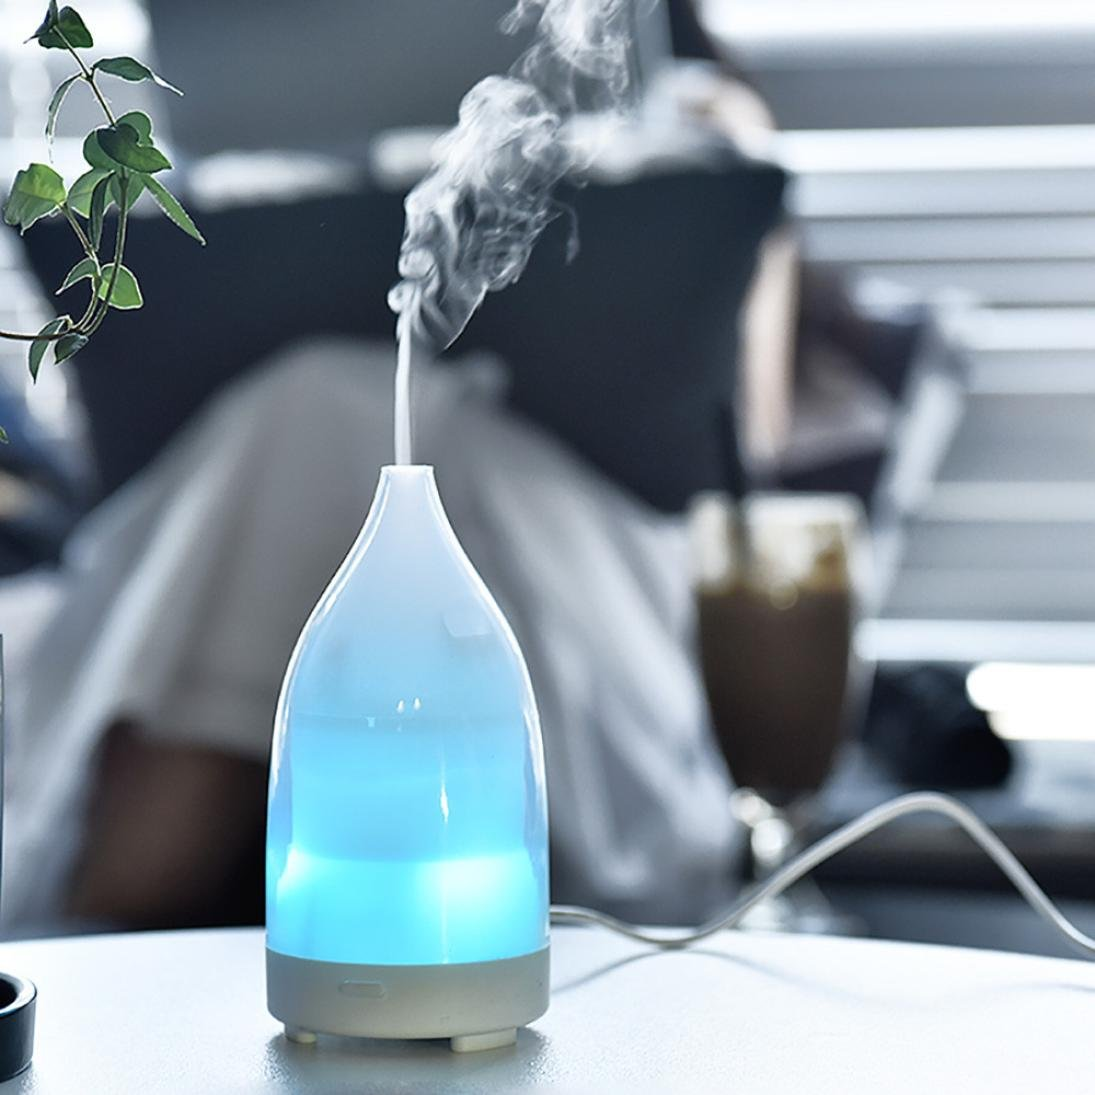 TAOtTAO USB Colorful Night Light Humidifier Aroma Air Diffuser Mist Maker (A)